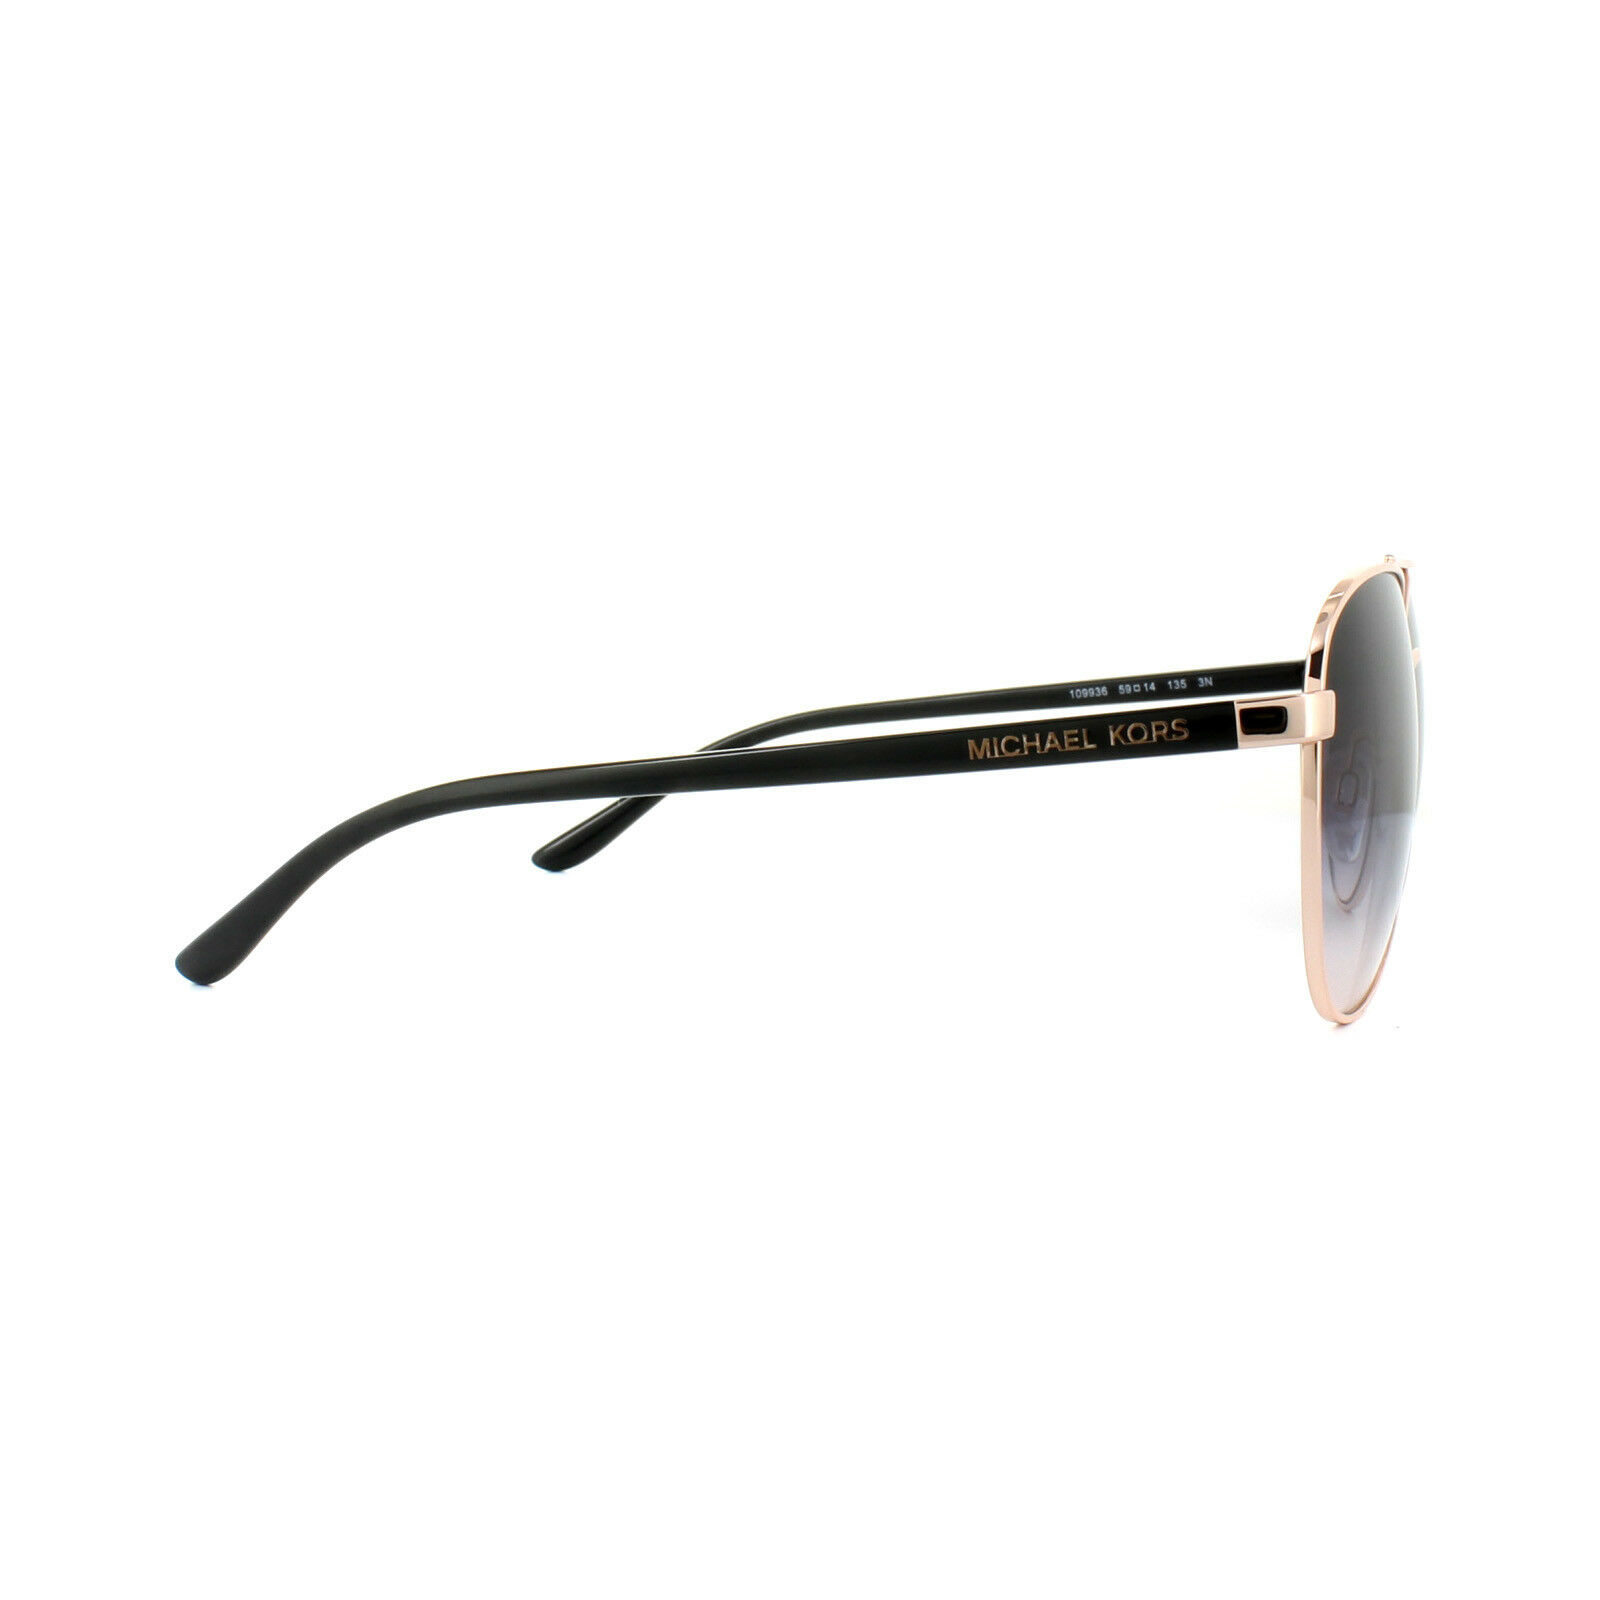 7a6b3723b9 Michael Kors Mk5007 Hvar 109936 Gold Ladies DESIGNER Sunglasses